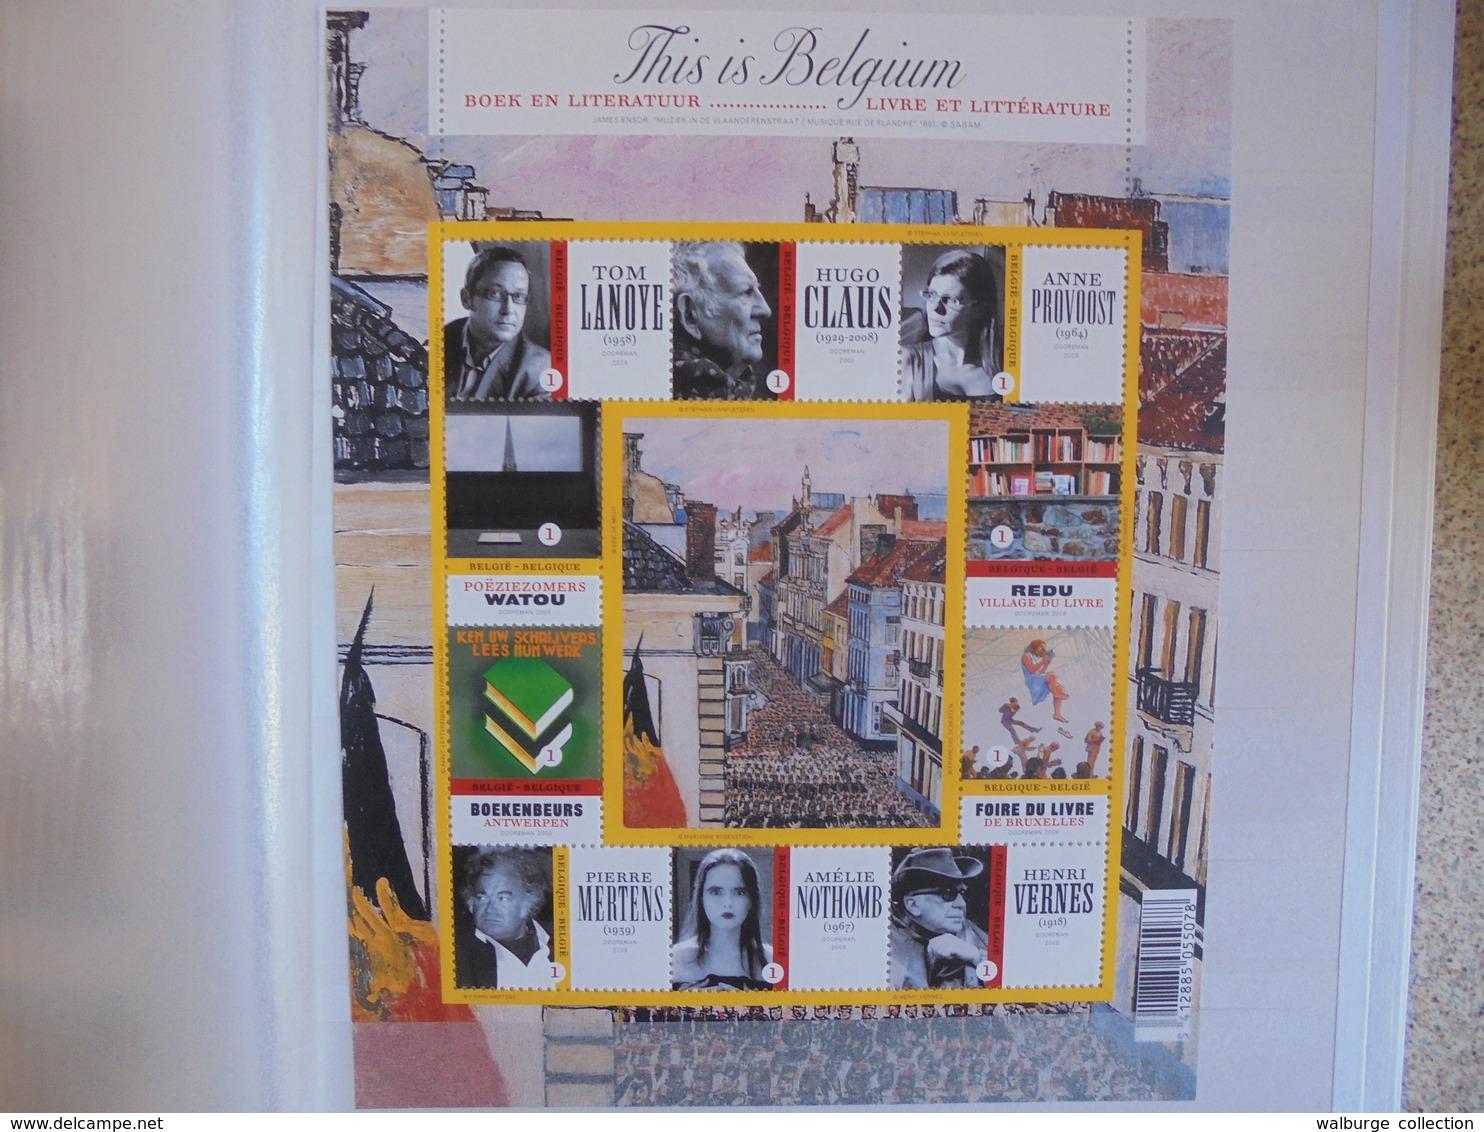 BELGIQUE 2009-2016(TOUT EN NEUF) +- 1350 EURO DE FACIALE !!! (2119) 2 KILOS 300 - Belgium